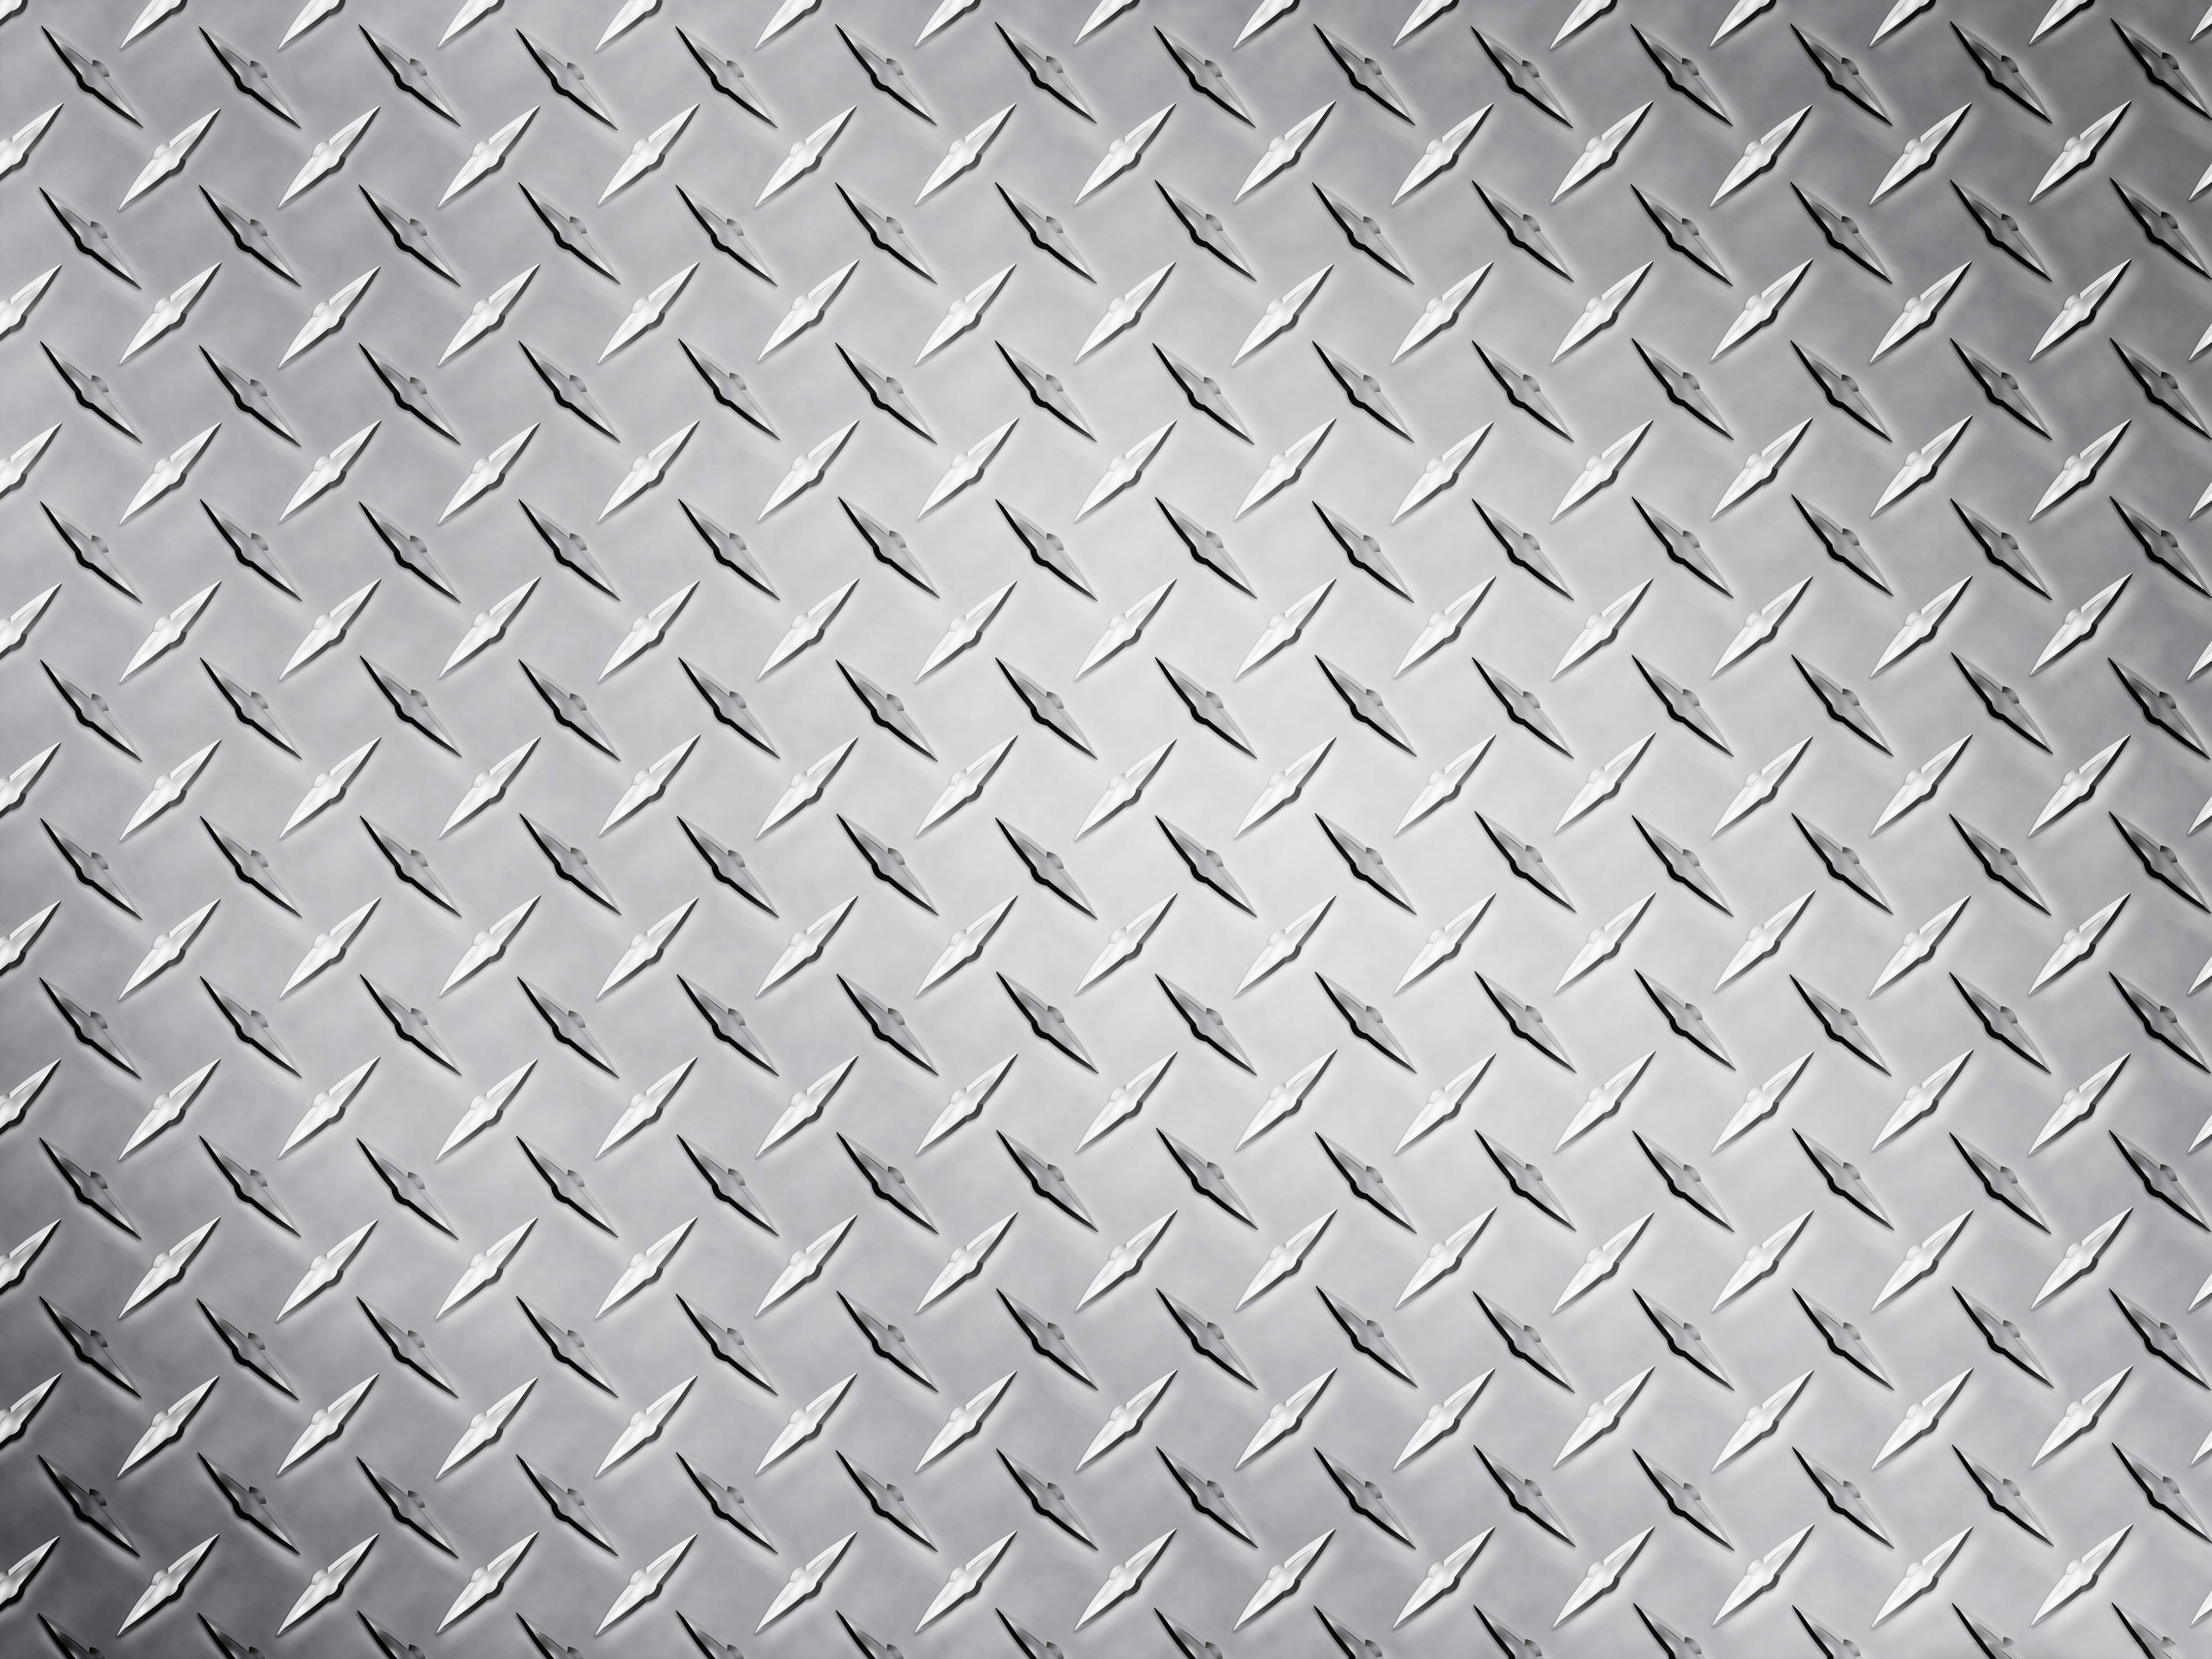 метал, железо, скачать фото, vtnfl wallpaper, iron